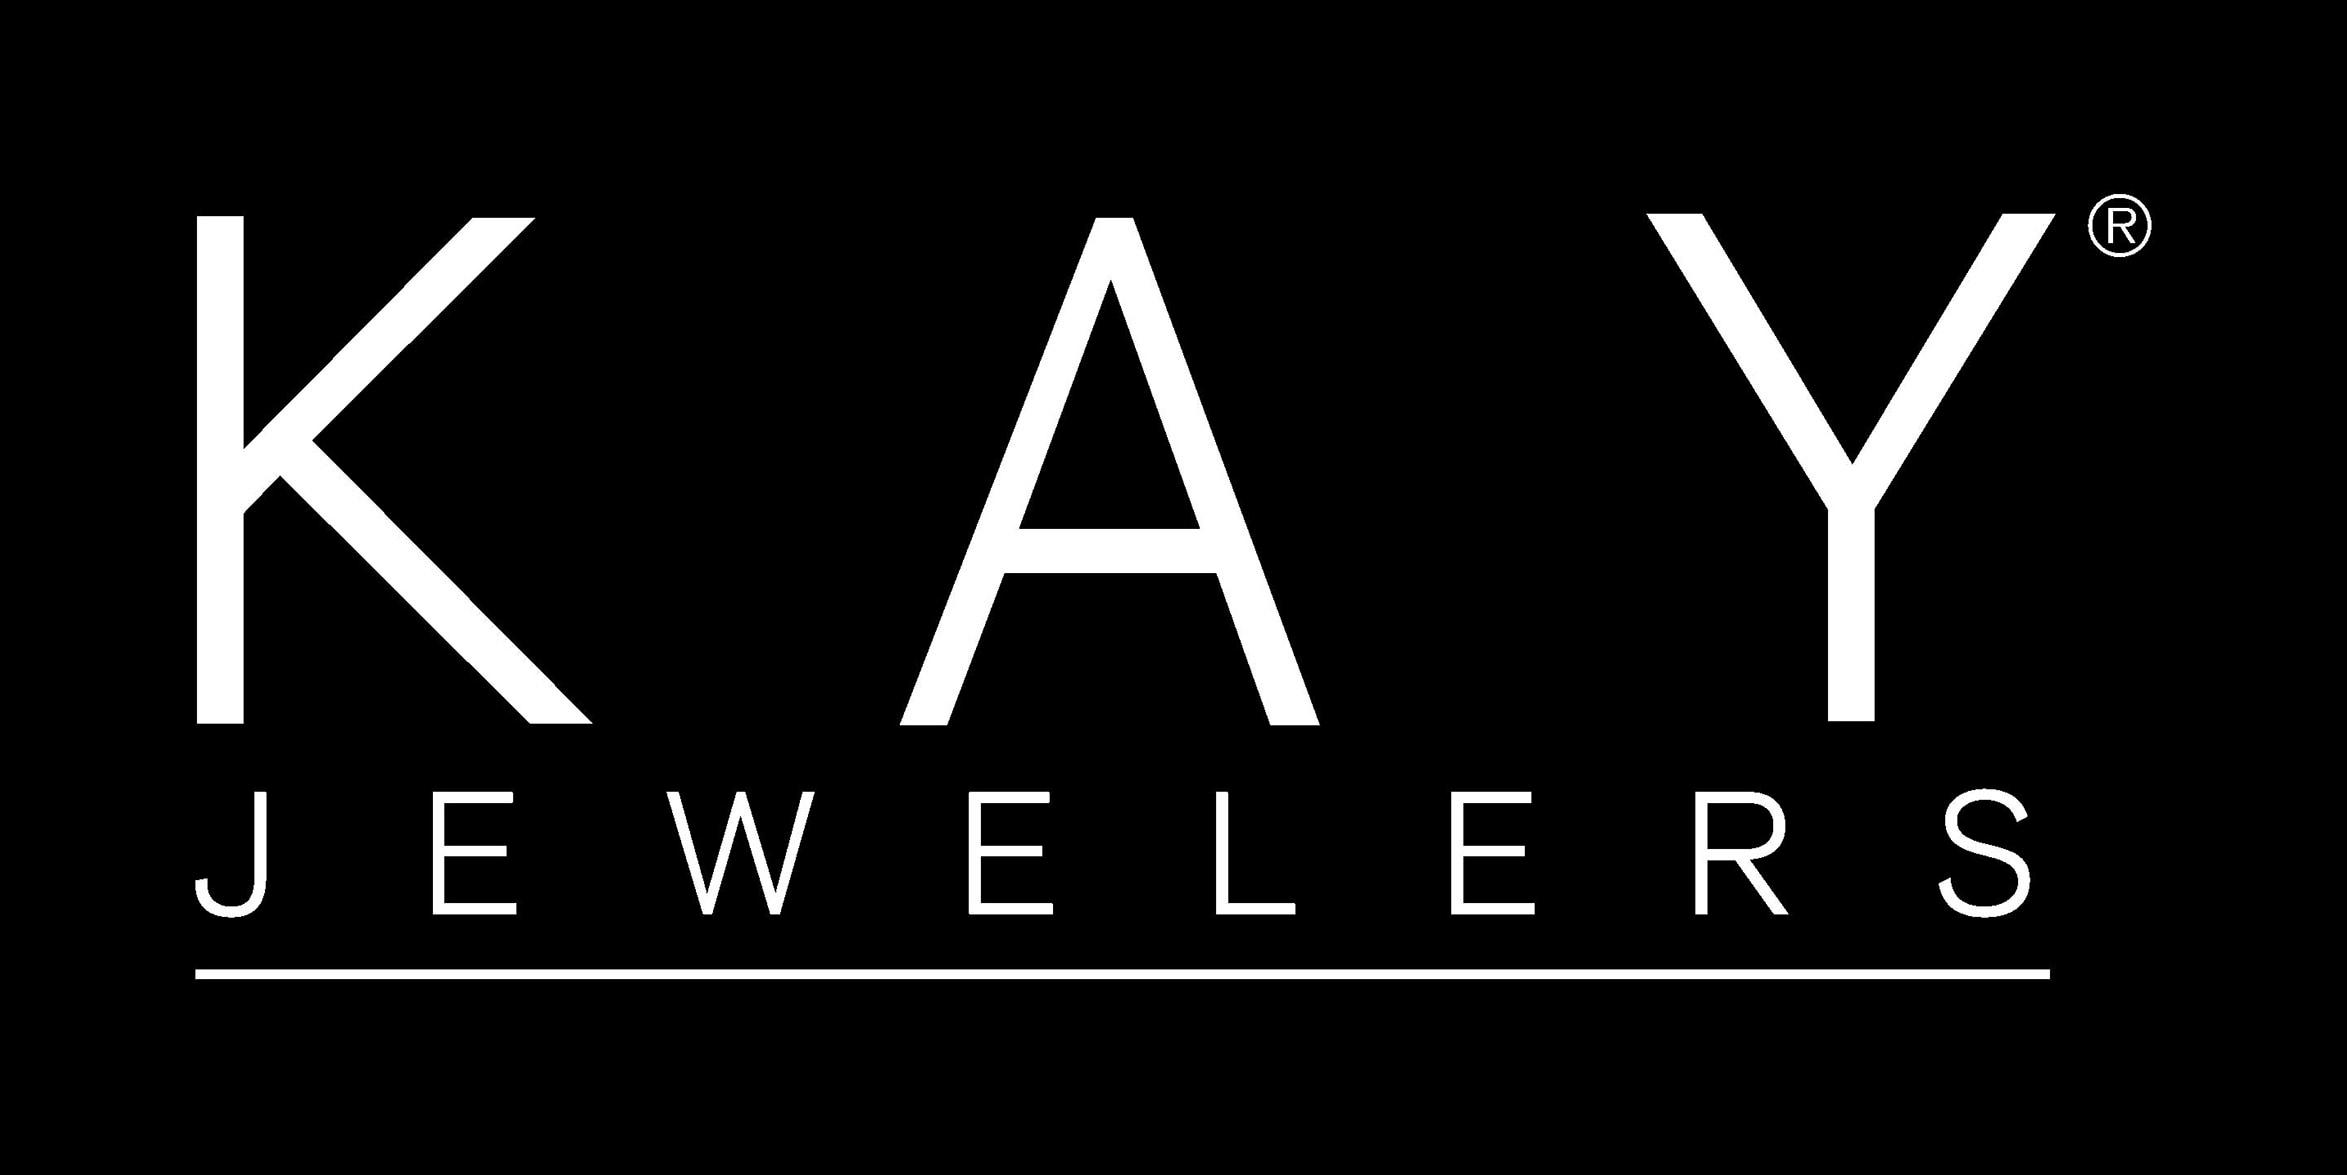 kay-jewelers.png